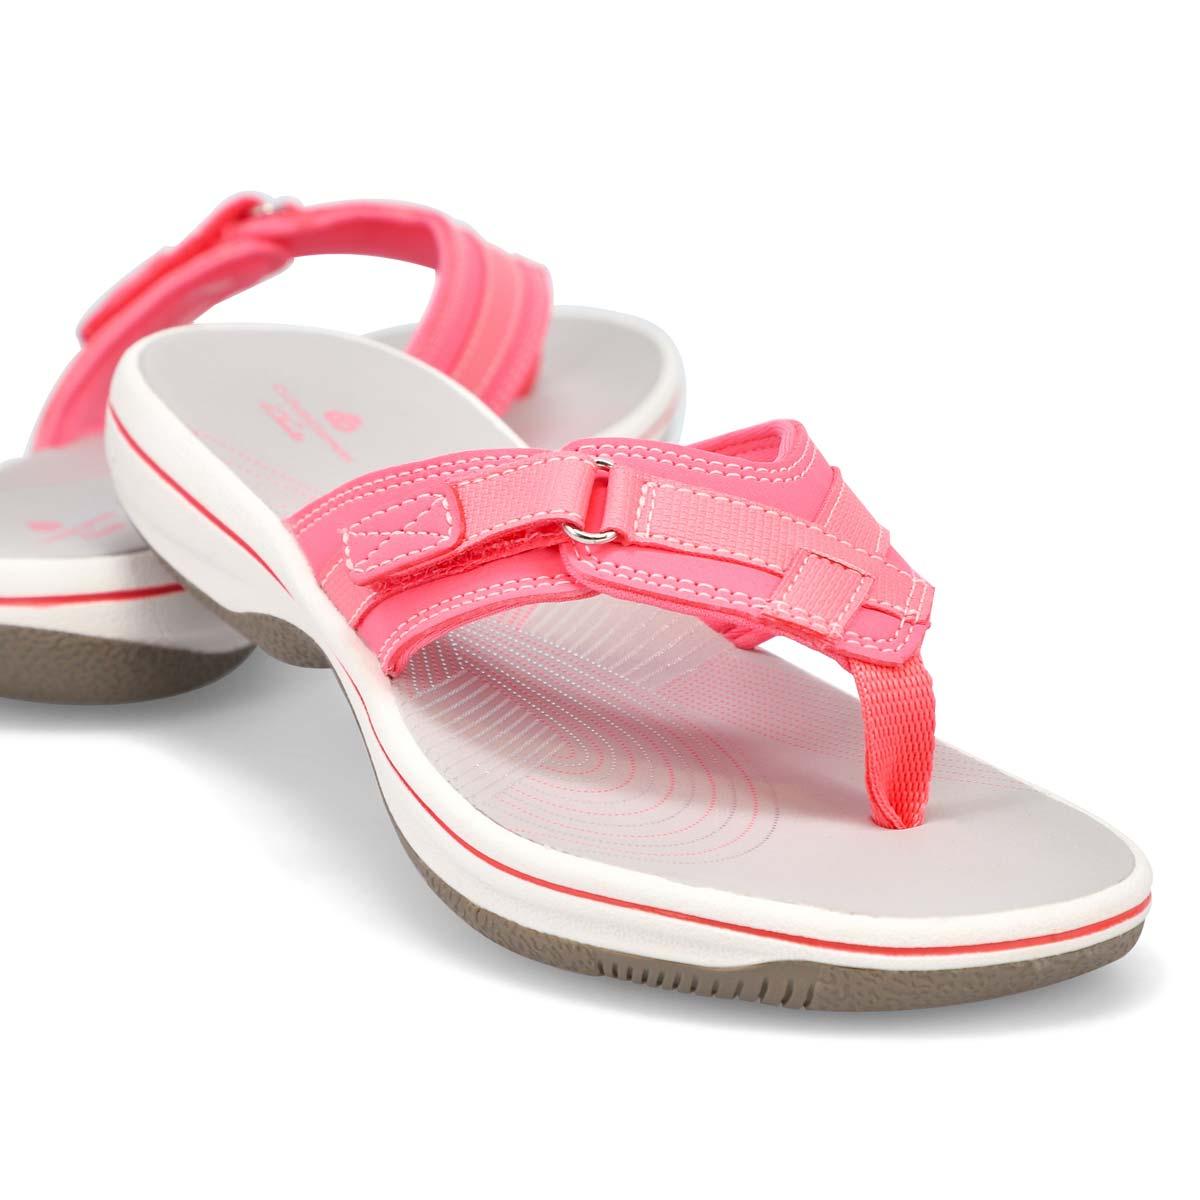 Sandale tong Breeze Sea, rose femmes